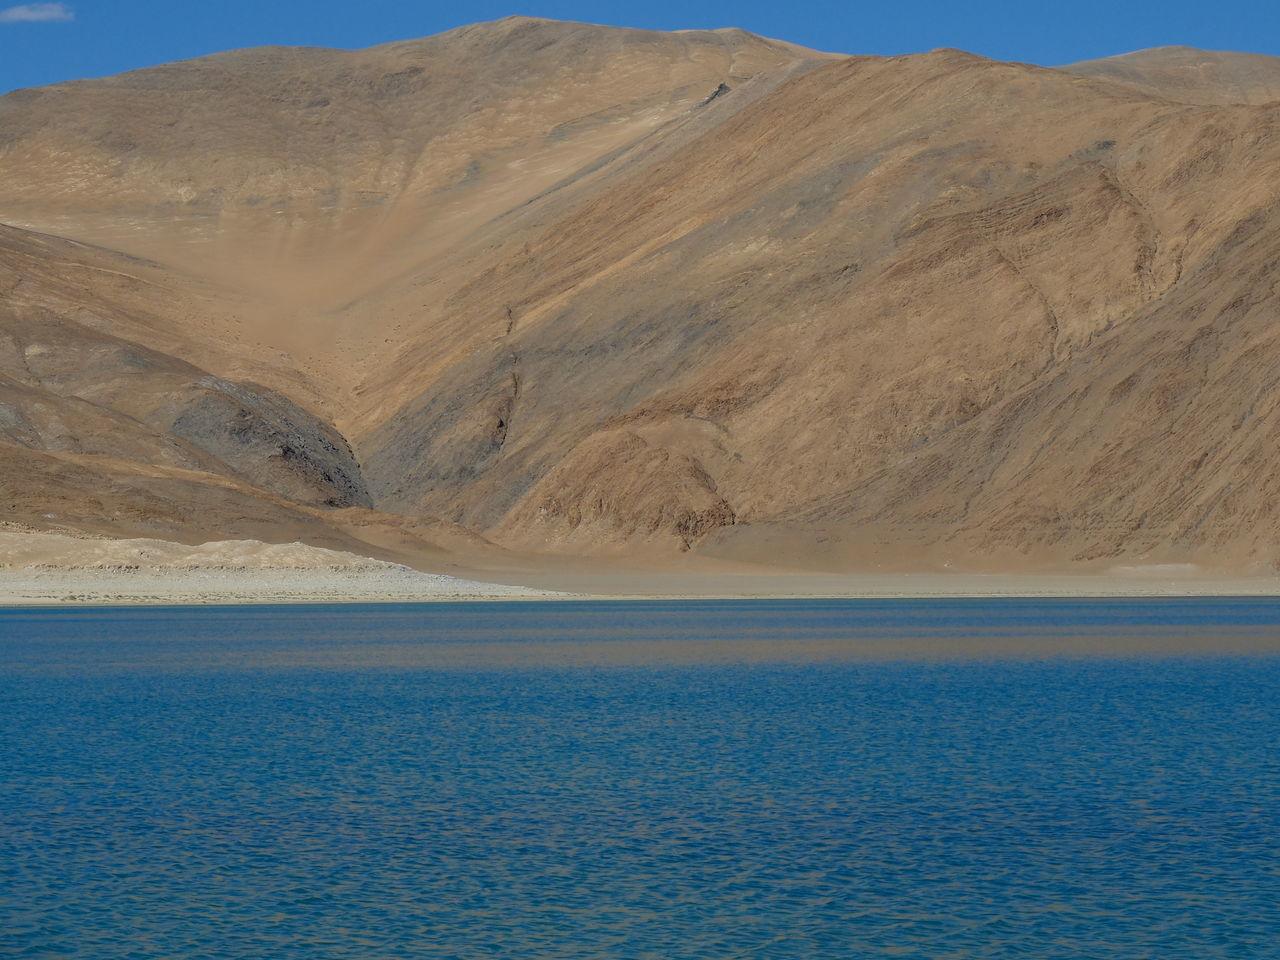 Arid Climate Beauty In Nature Day Desert Jammu And Kashmir Leh Ladakh Nature Nature Reserve No People Outdoors Pangong Lake Pangong Tso Sand Sand Dune Scenics Sky Water